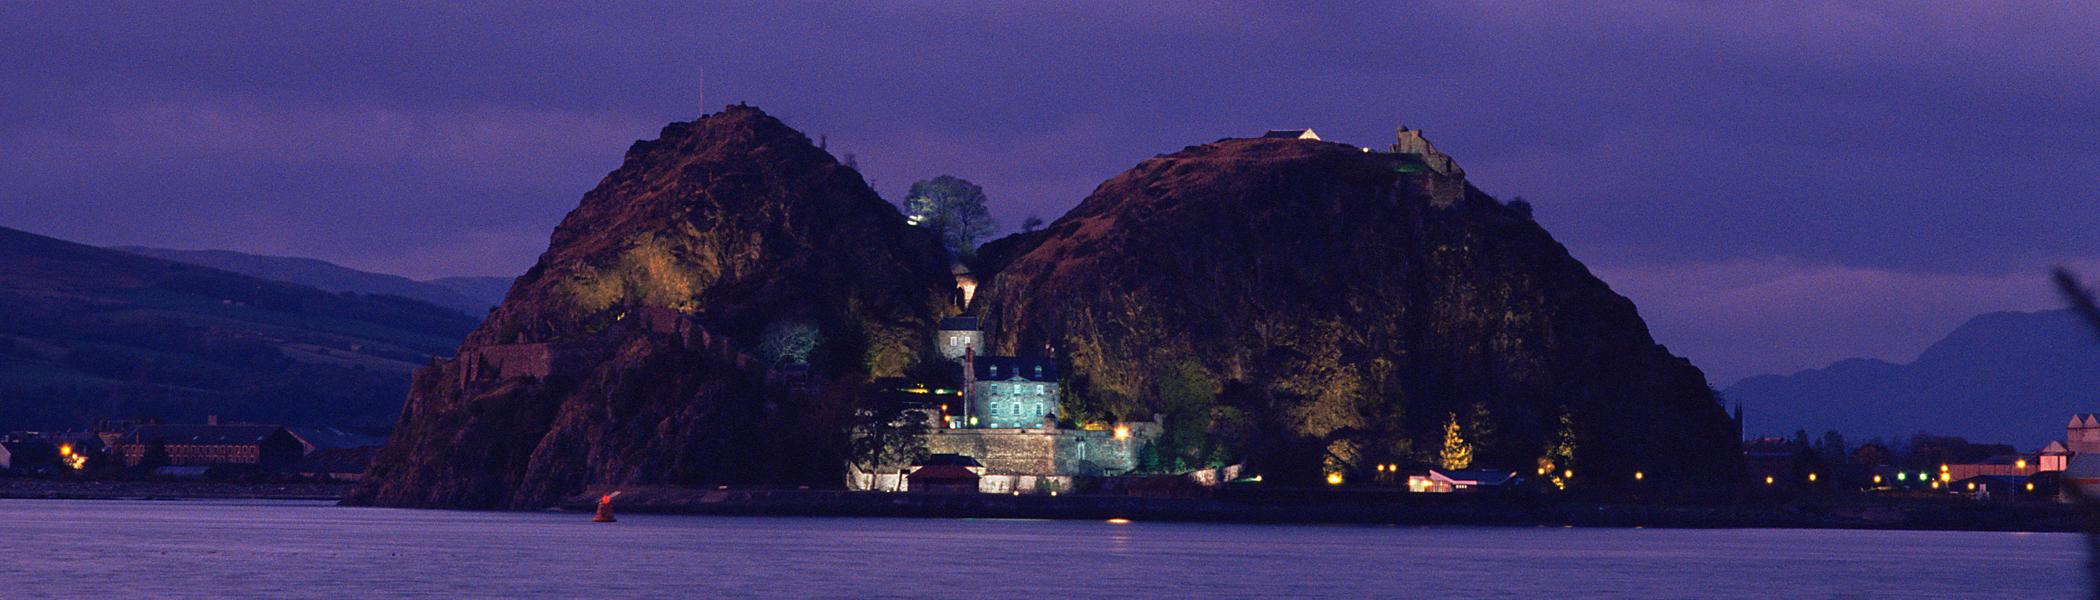 Image Credit: VisitScotland / Kenny Lam